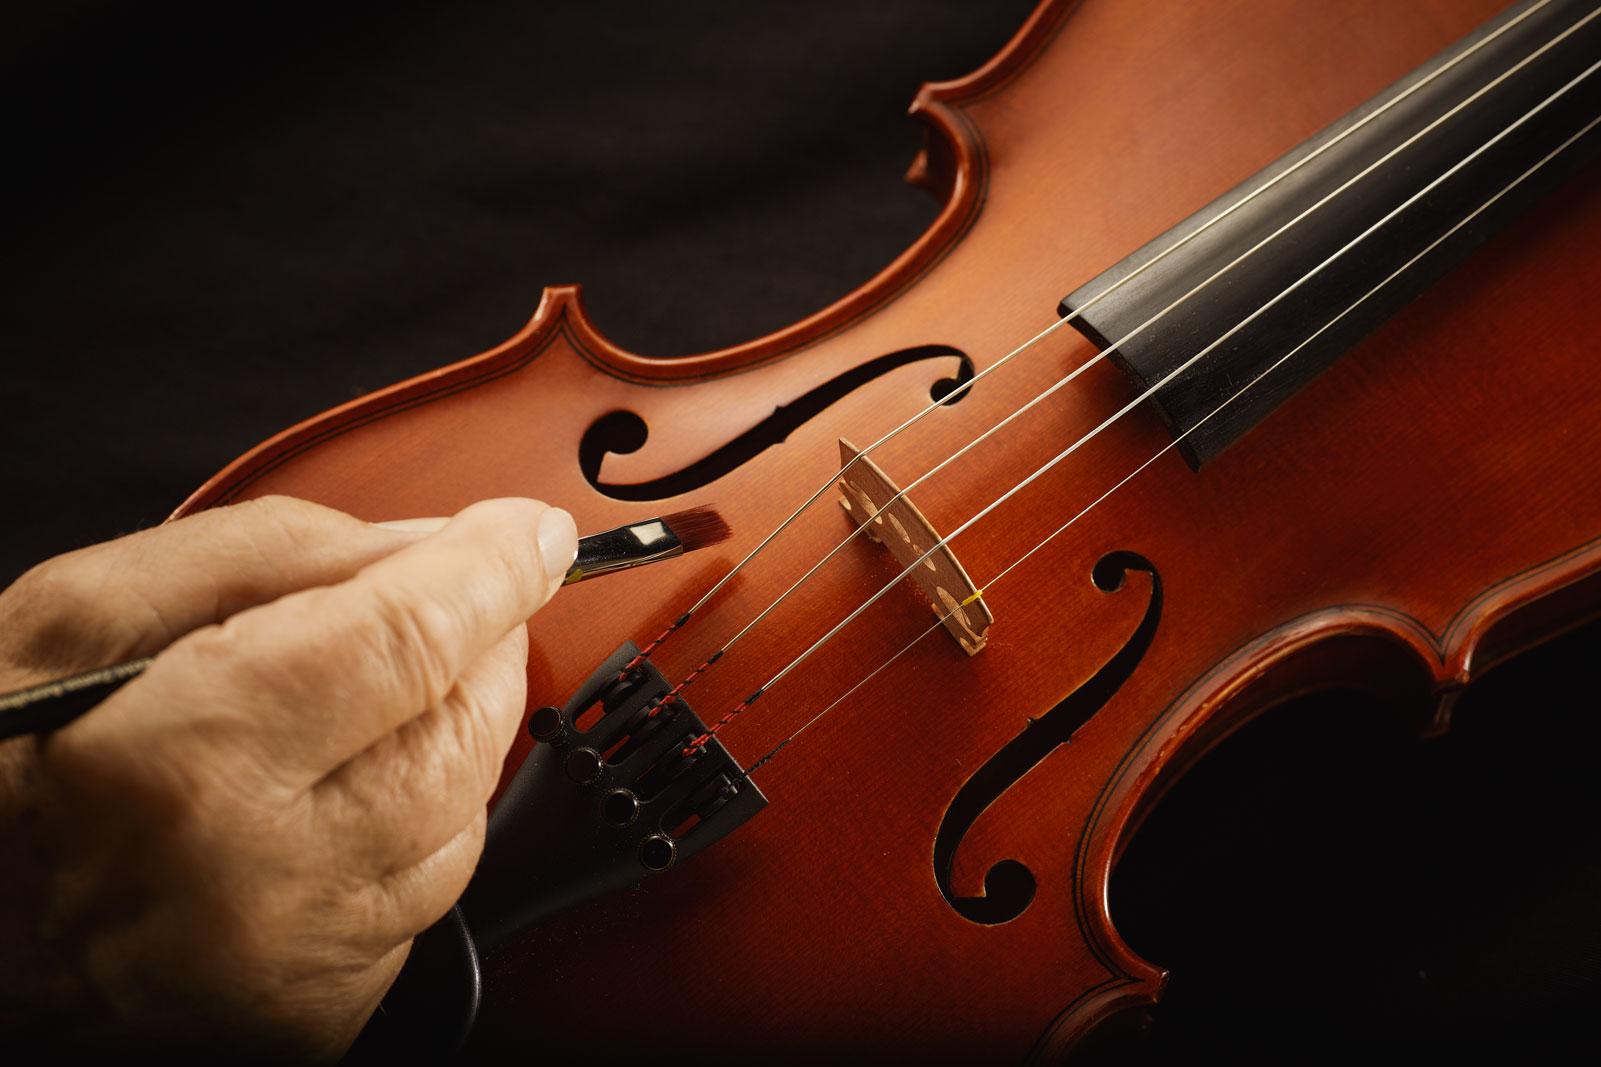 Geige Hand Konstruktion Malen Farbe Geigenbau Pinsel Still Produkt